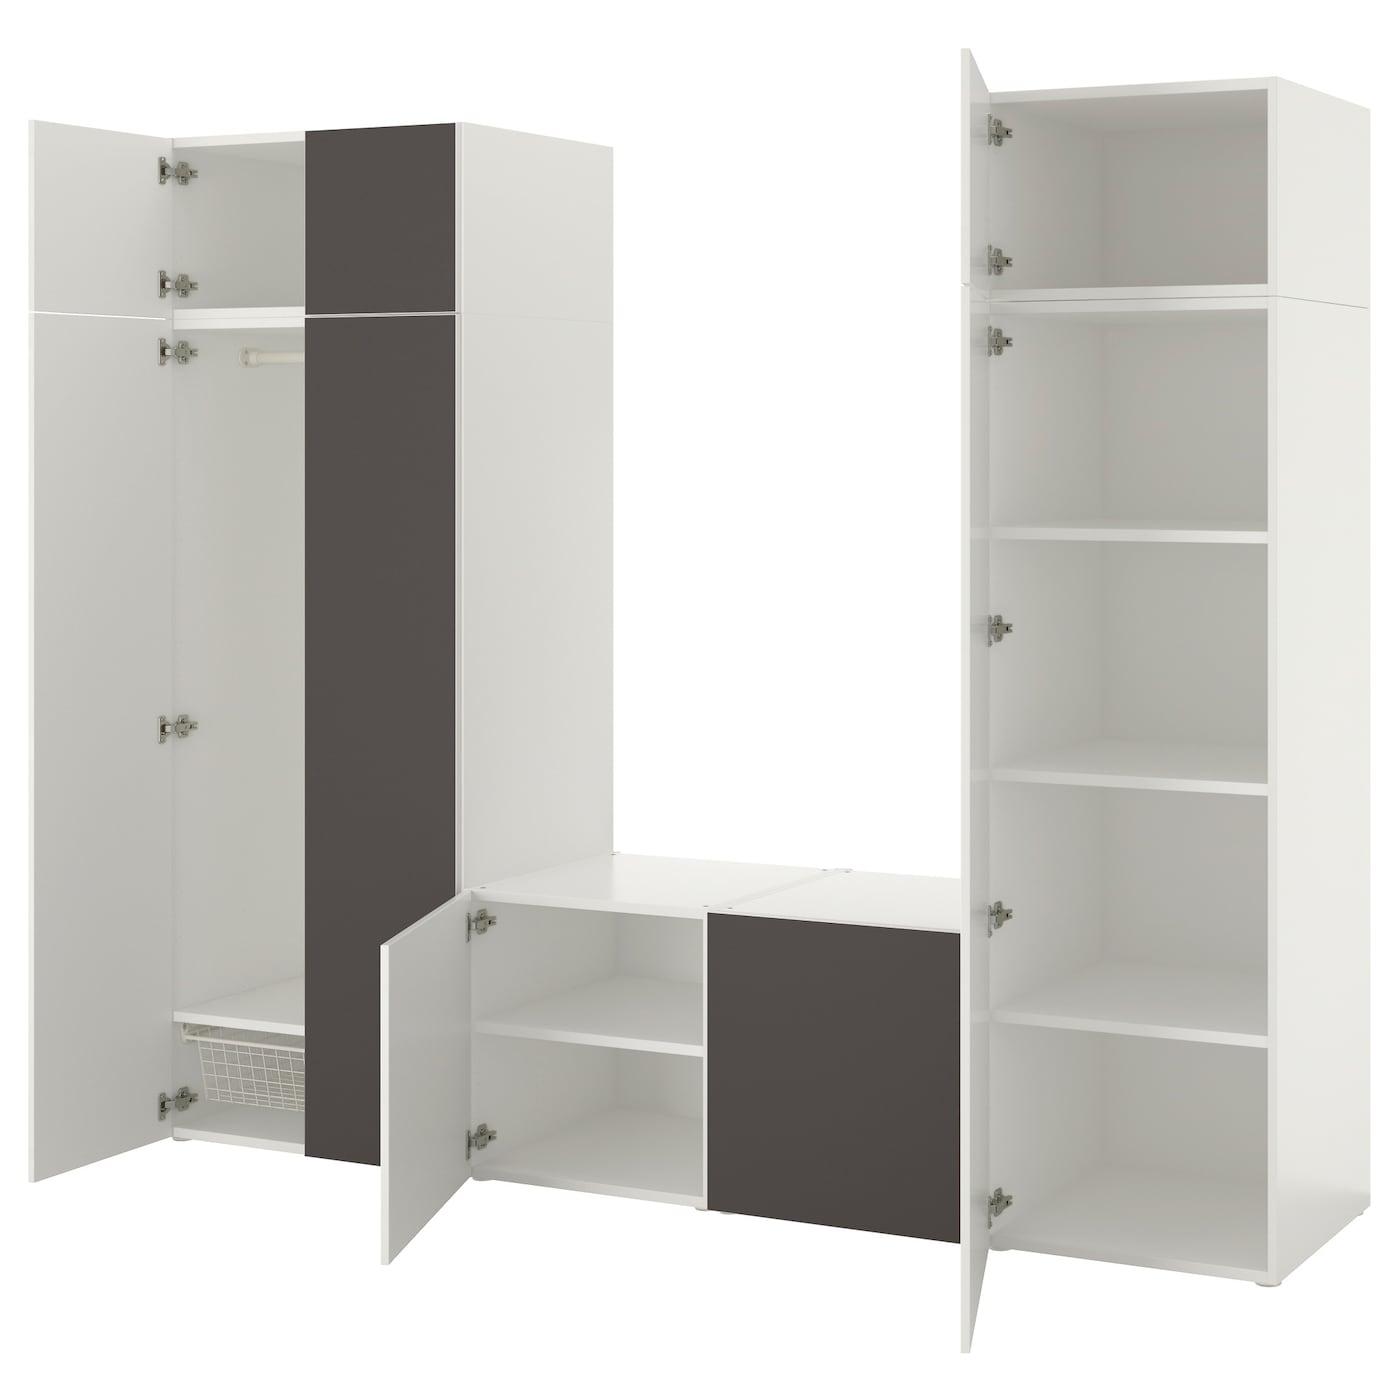 platsa kledingkast wit skatval donkergrijs 260 x 57 x 221 cm ikea. Black Bedroom Furniture Sets. Home Design Ideas